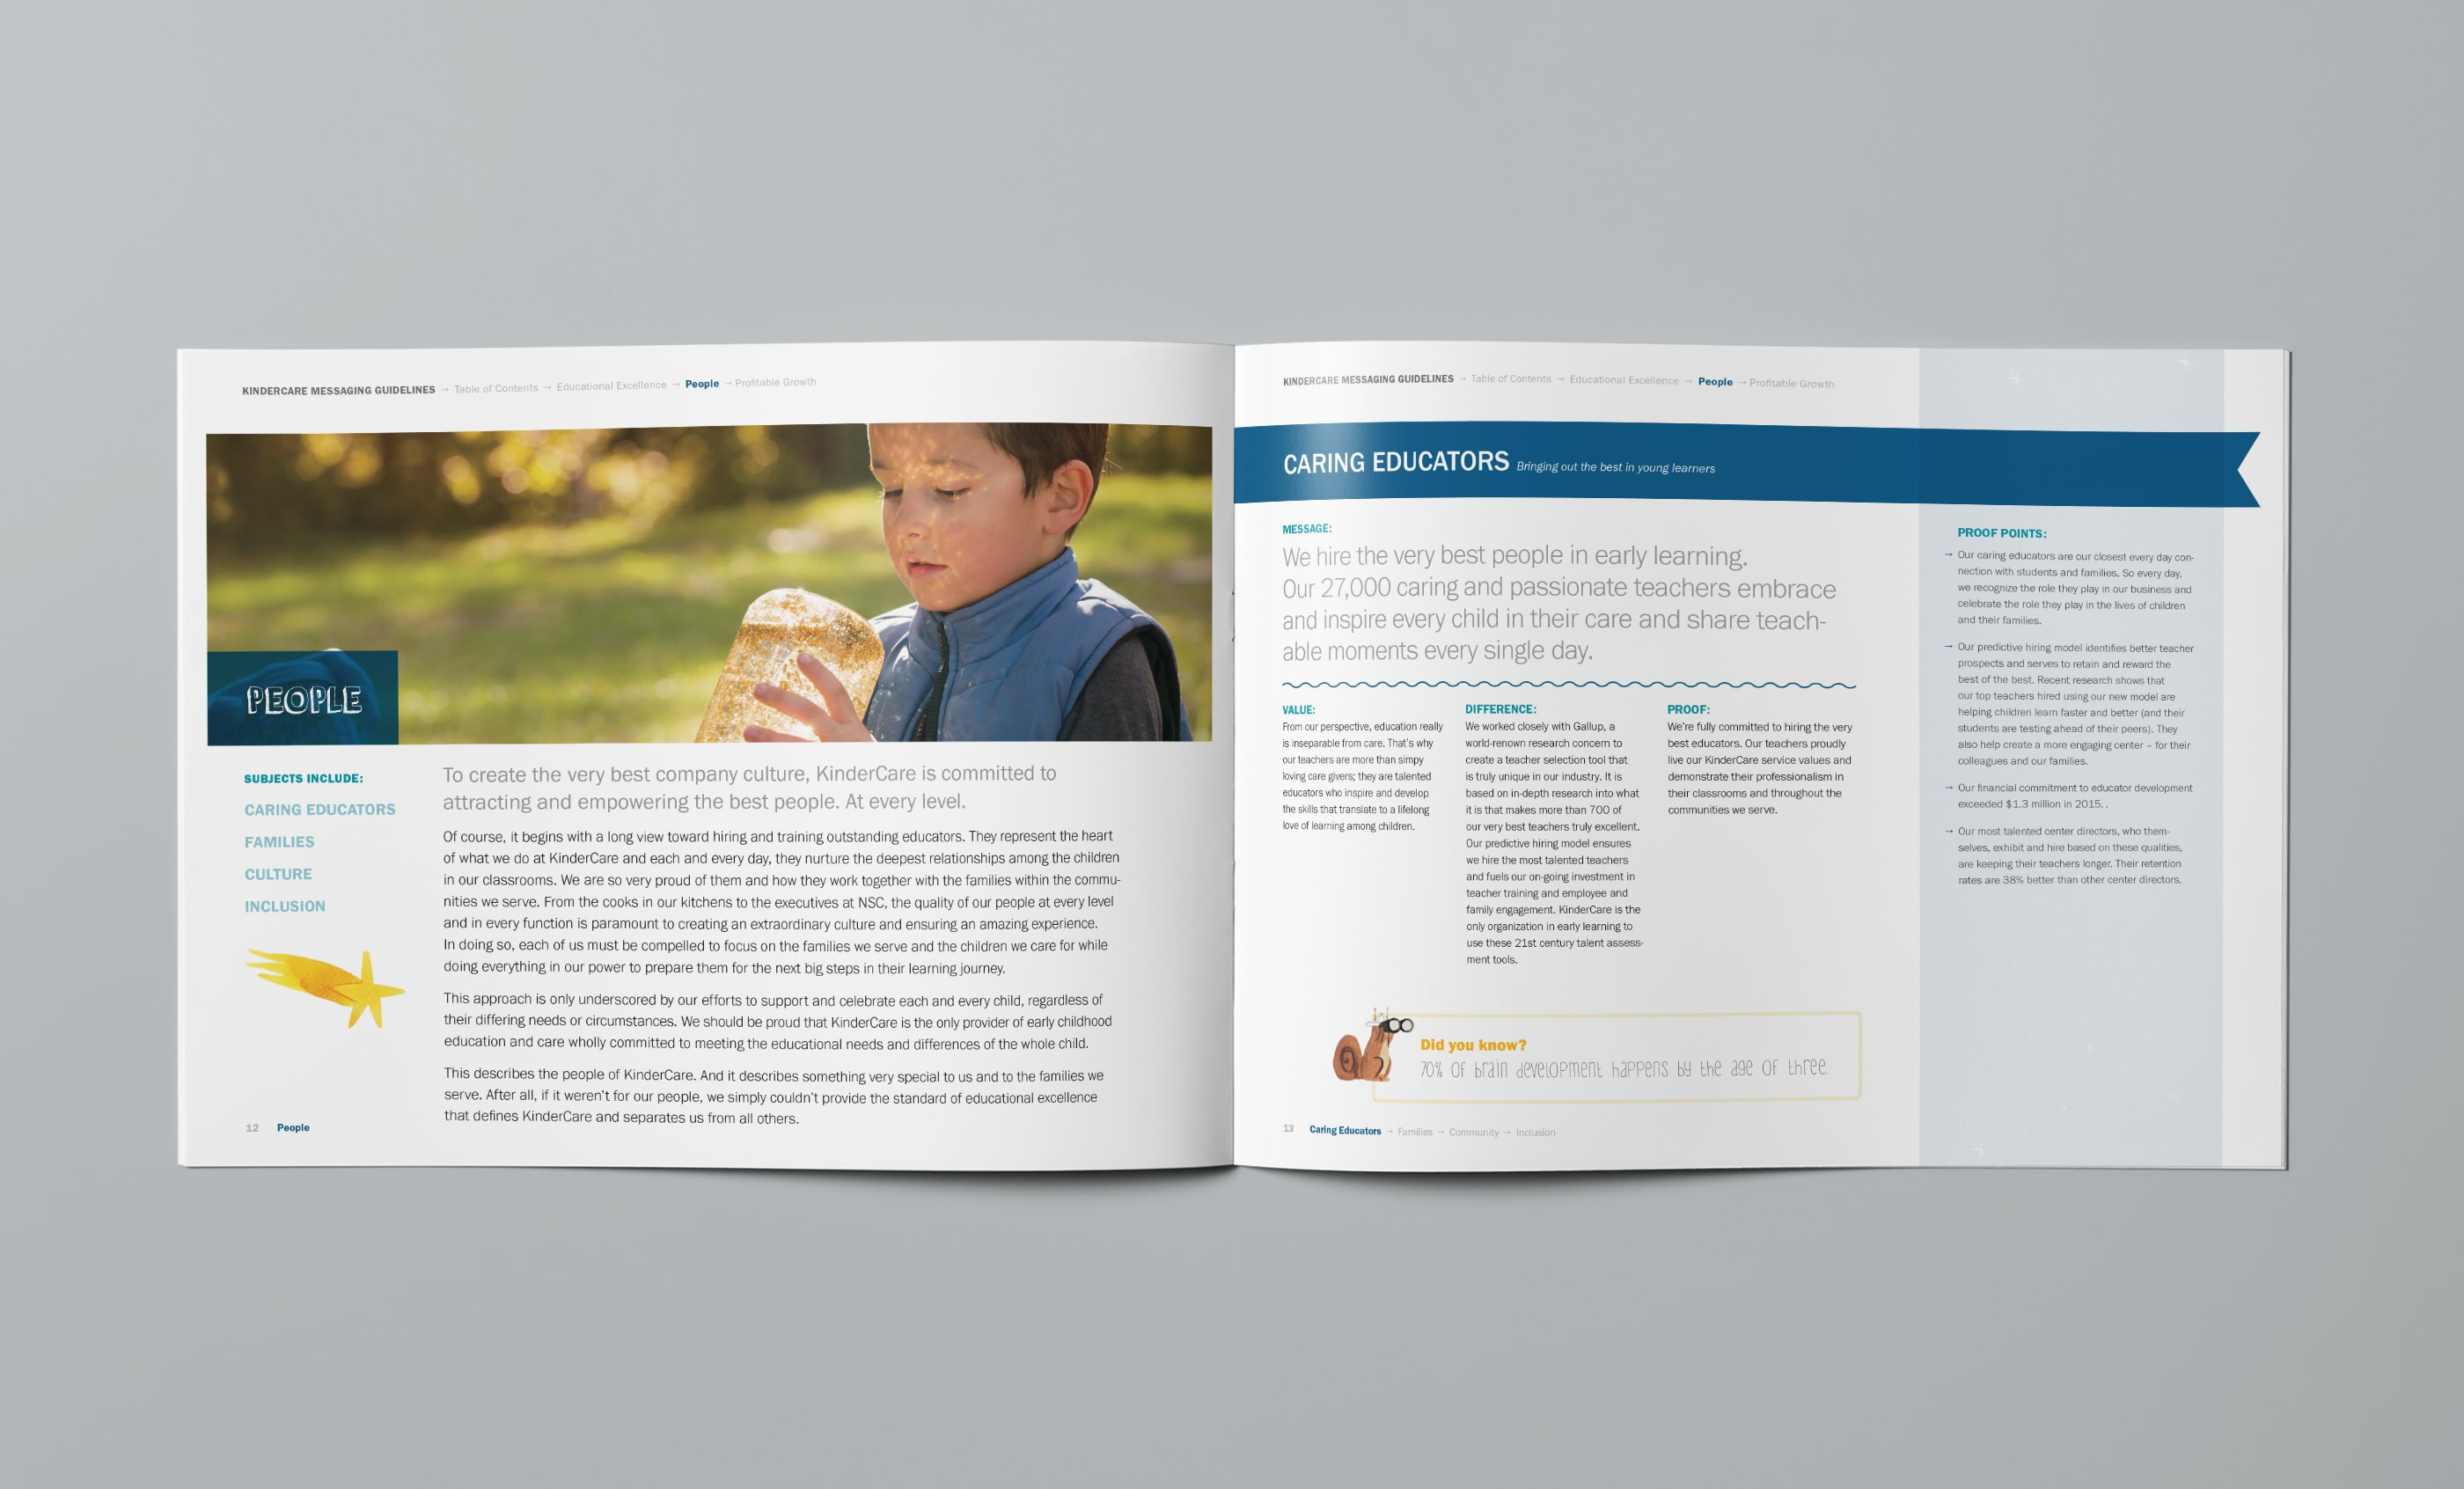 Messaging Guide: Caring Educators